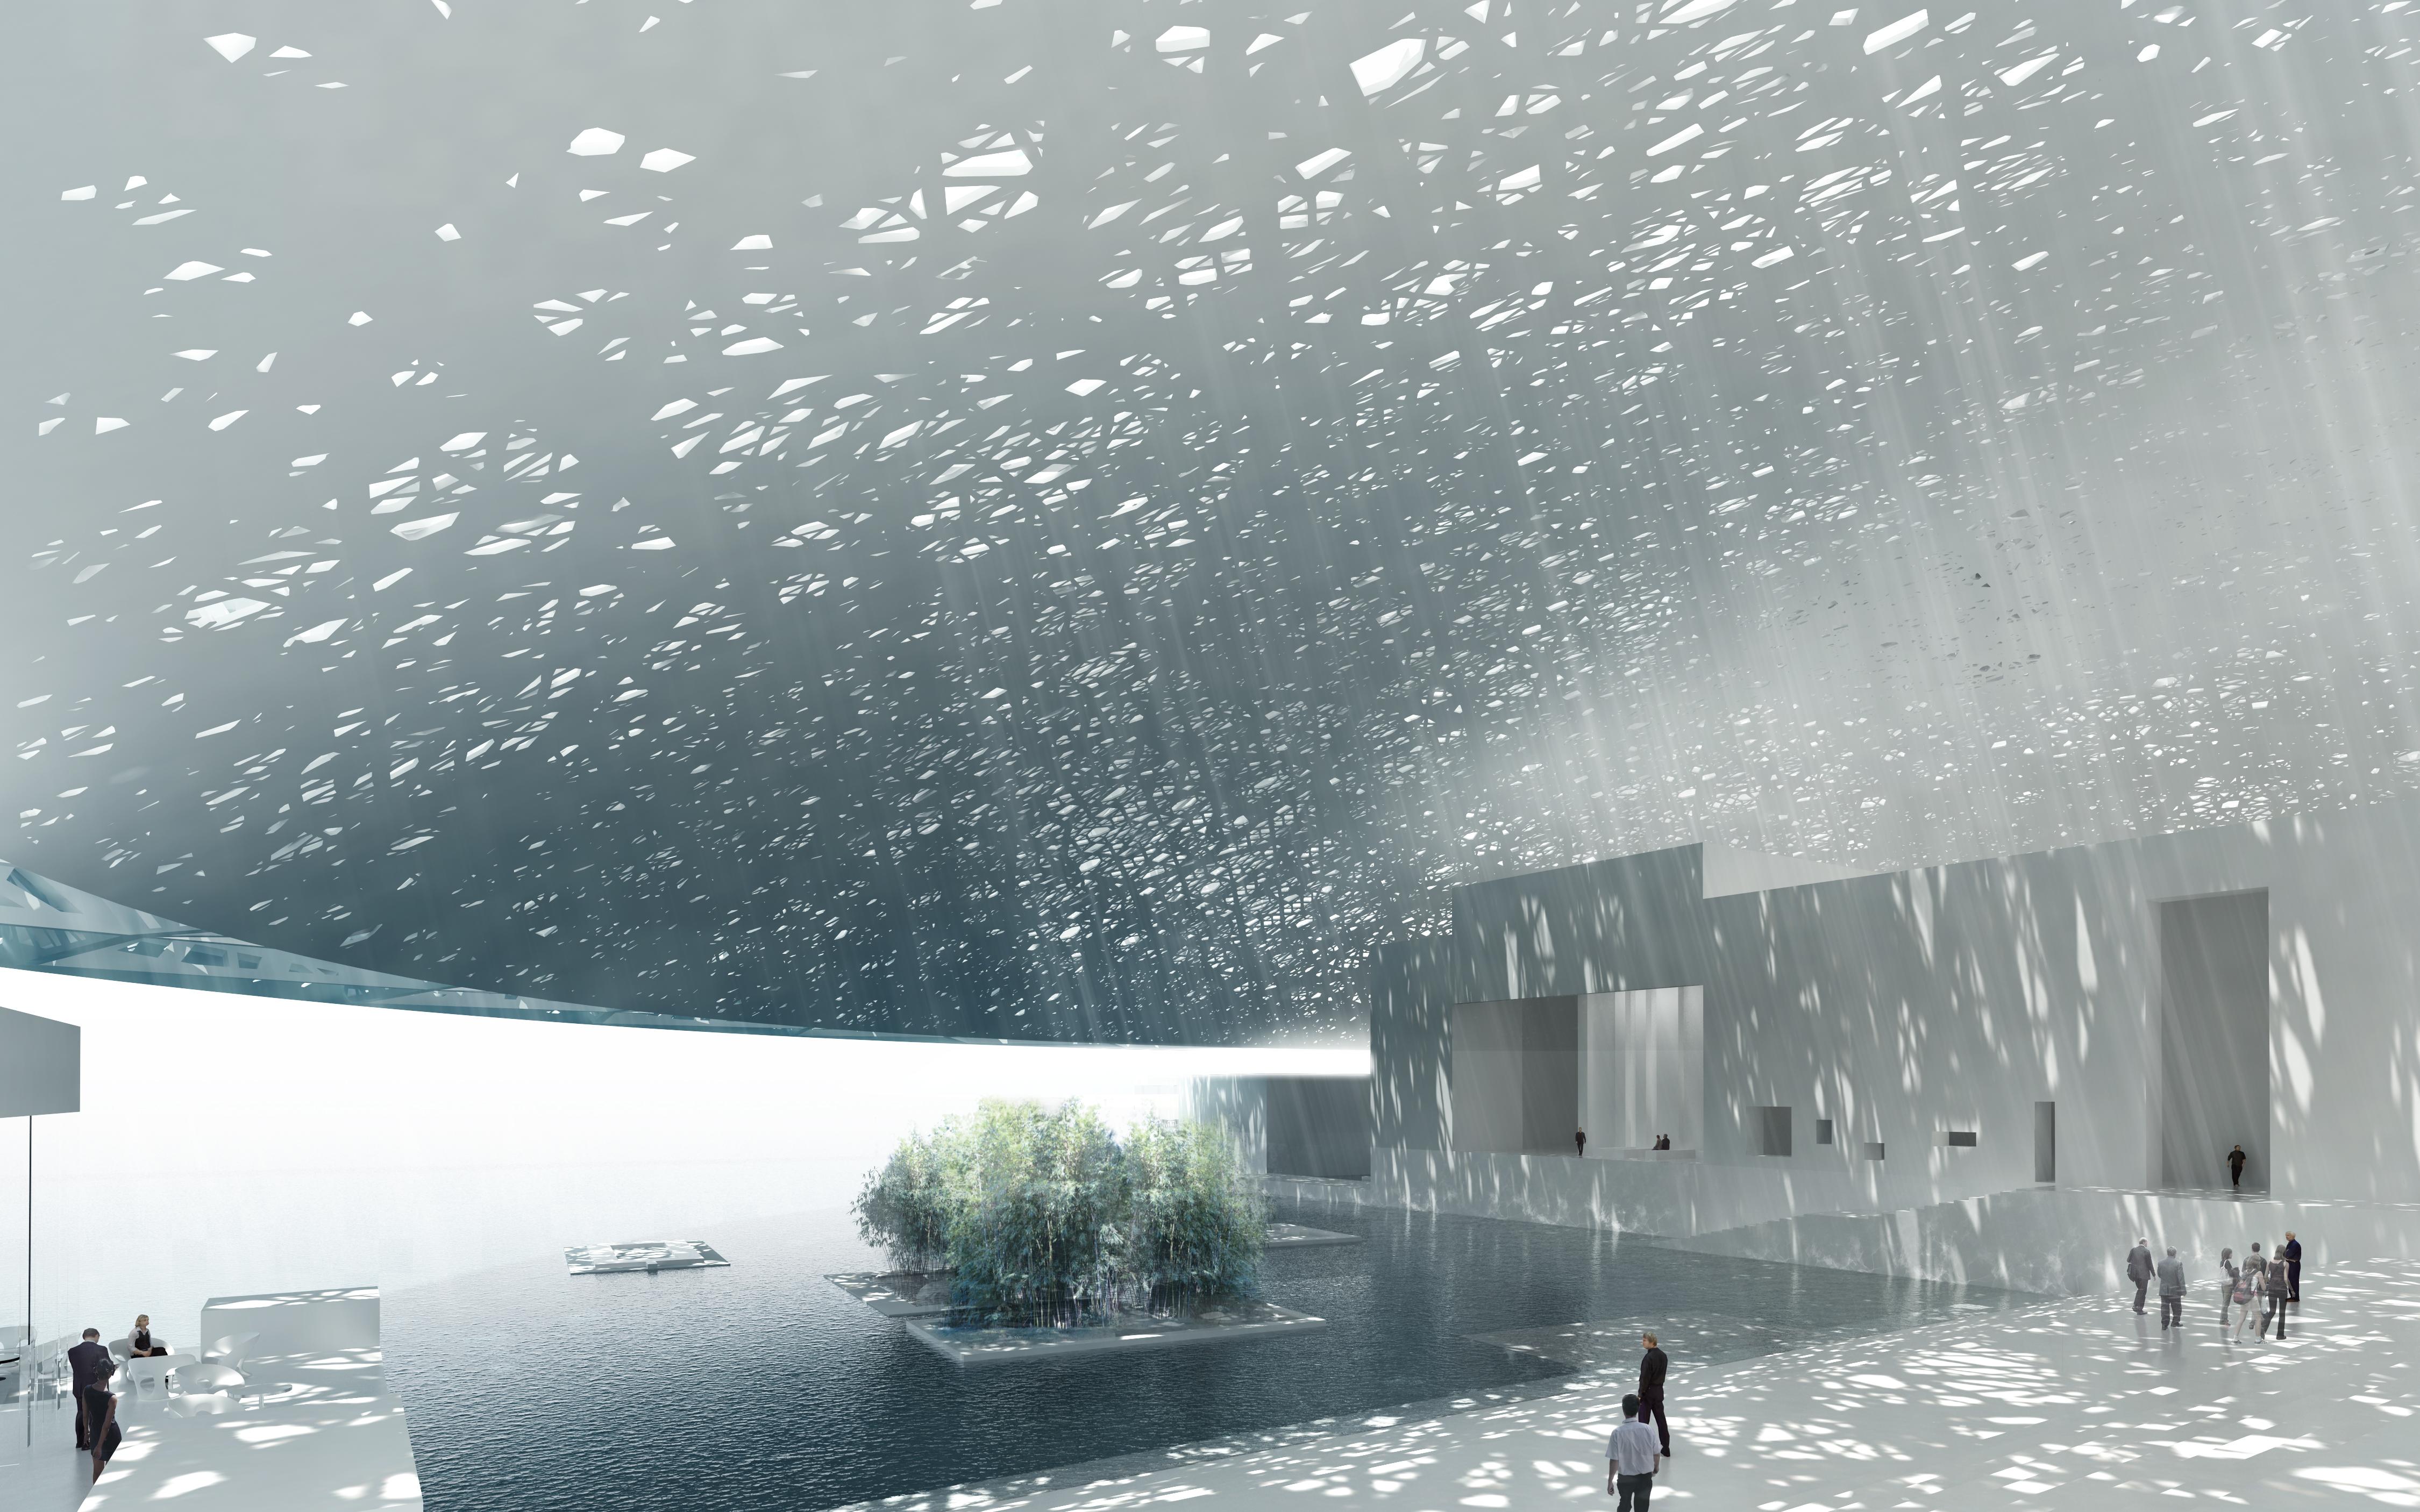 <p>© TDIC, Architect: Ateliers Jean Nouvel </p>